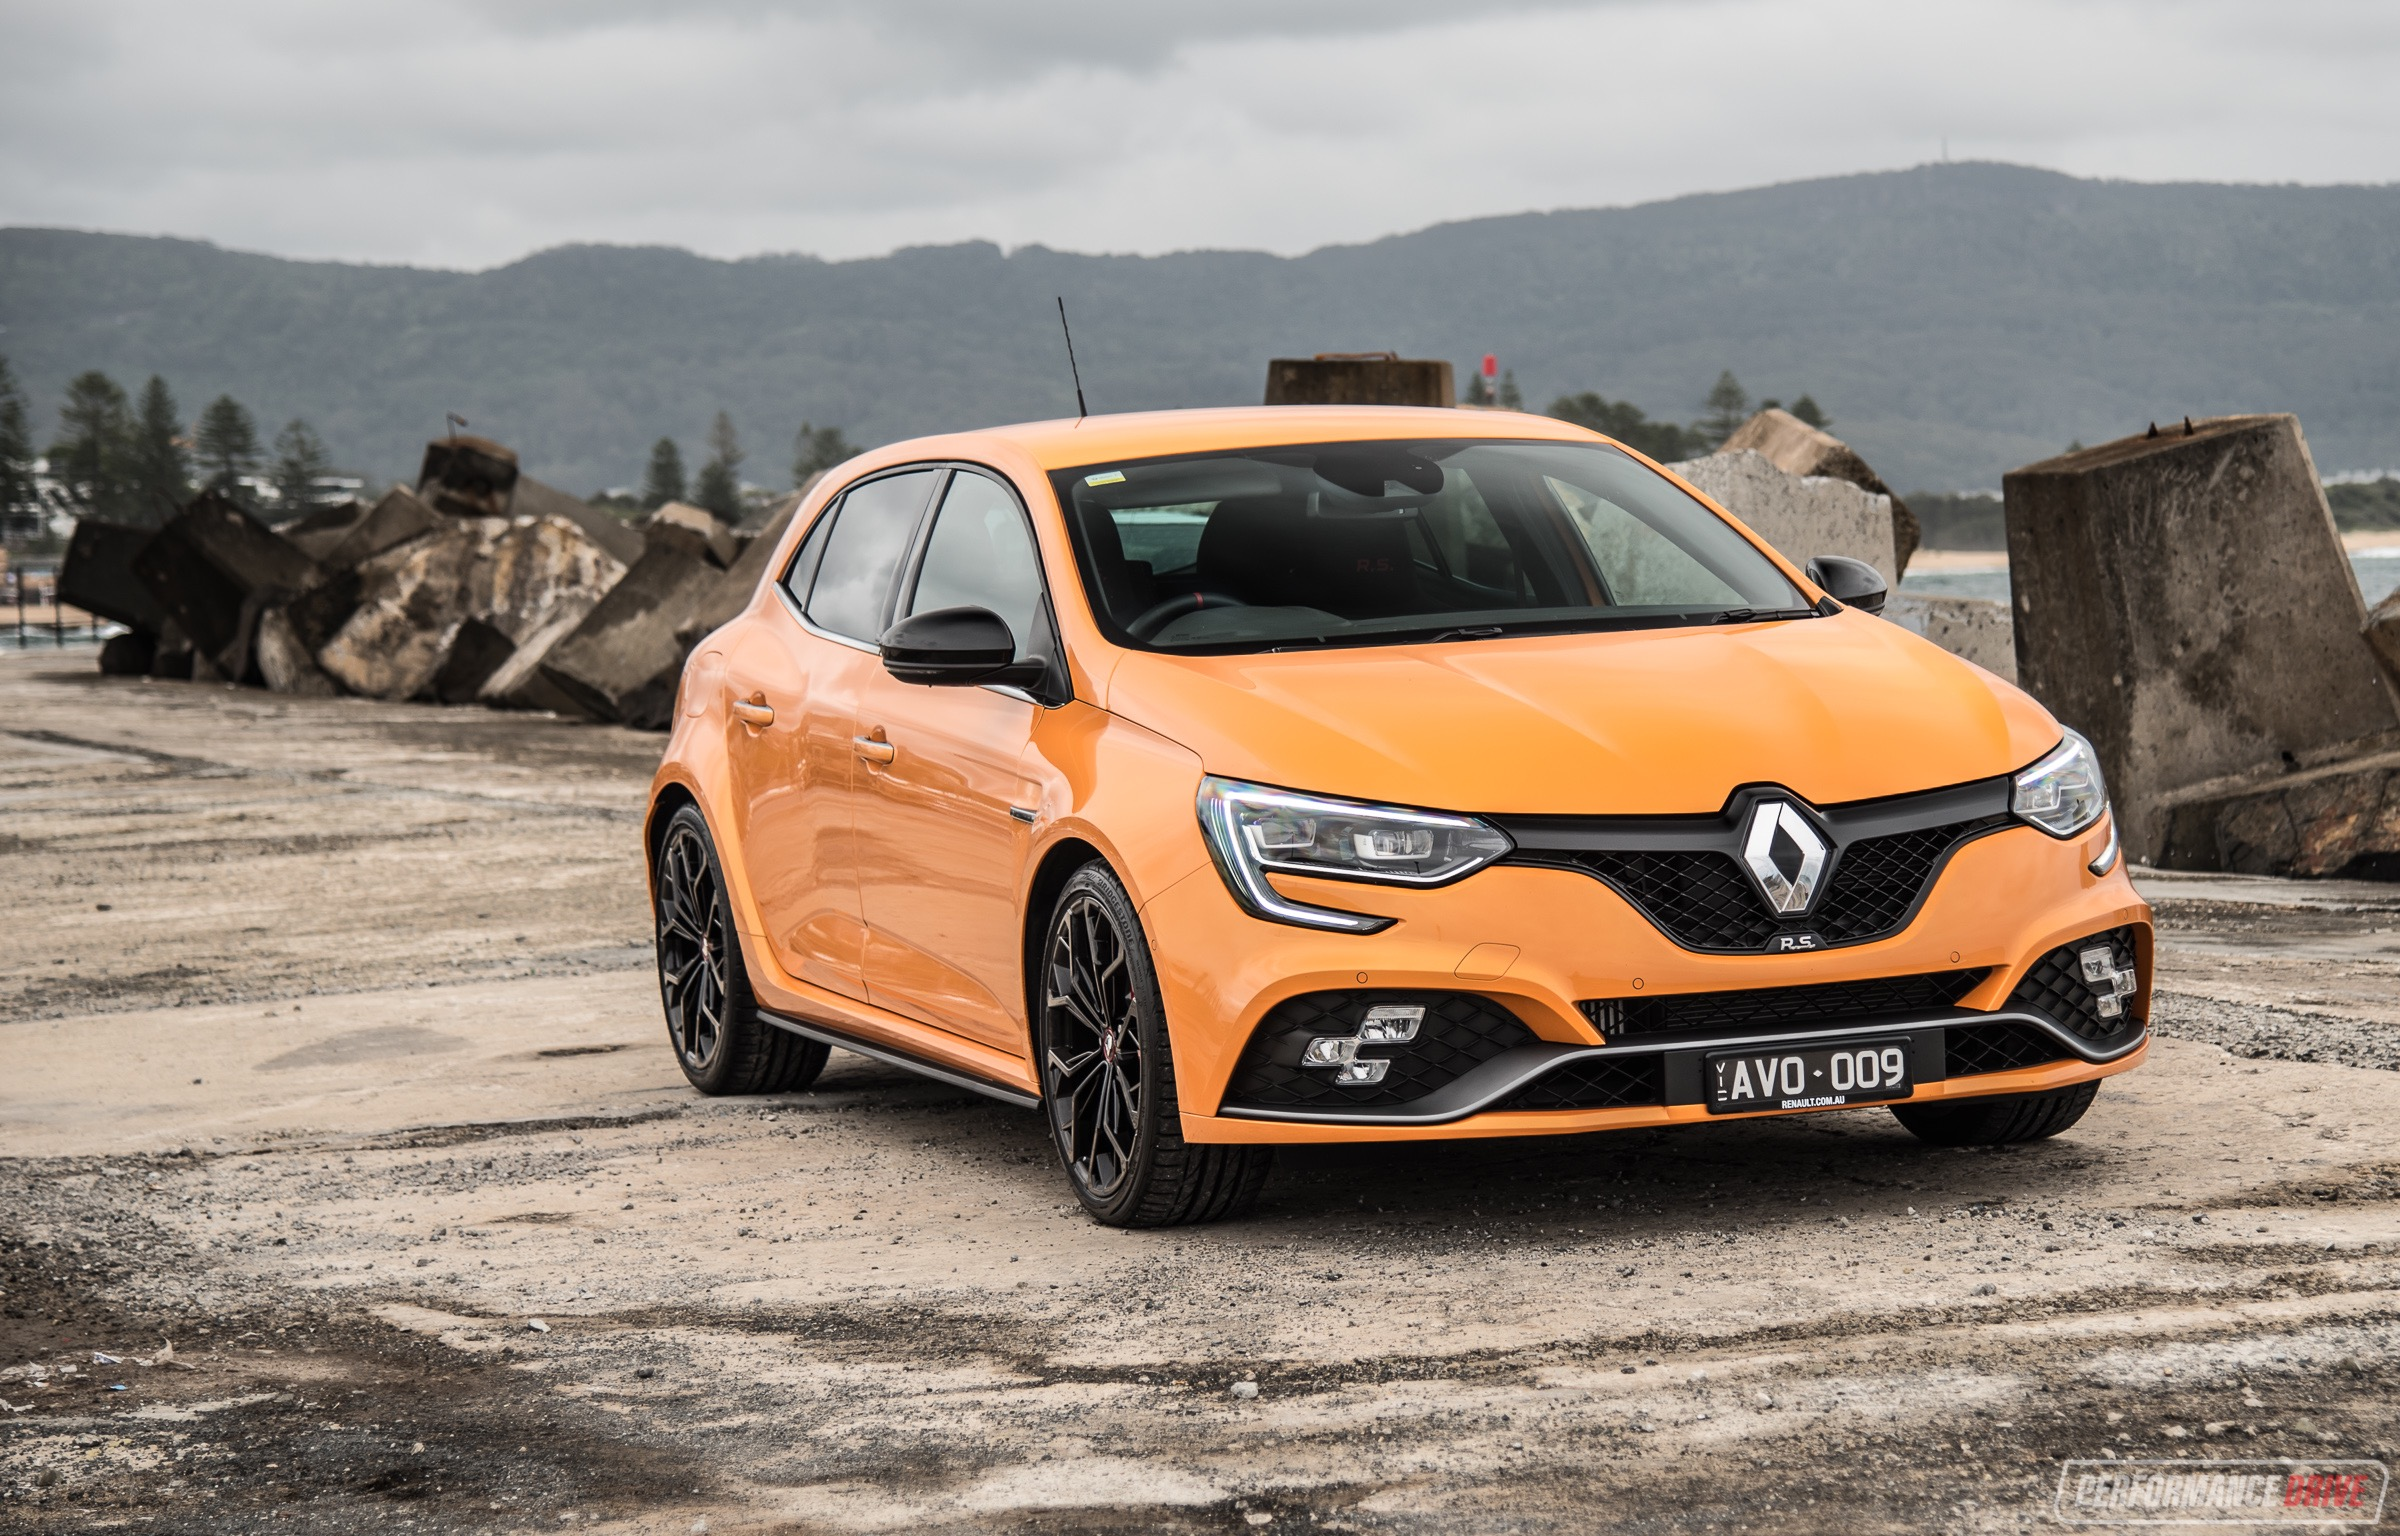 2019 Renault Megane Rs Cup Review Video Performancedrive